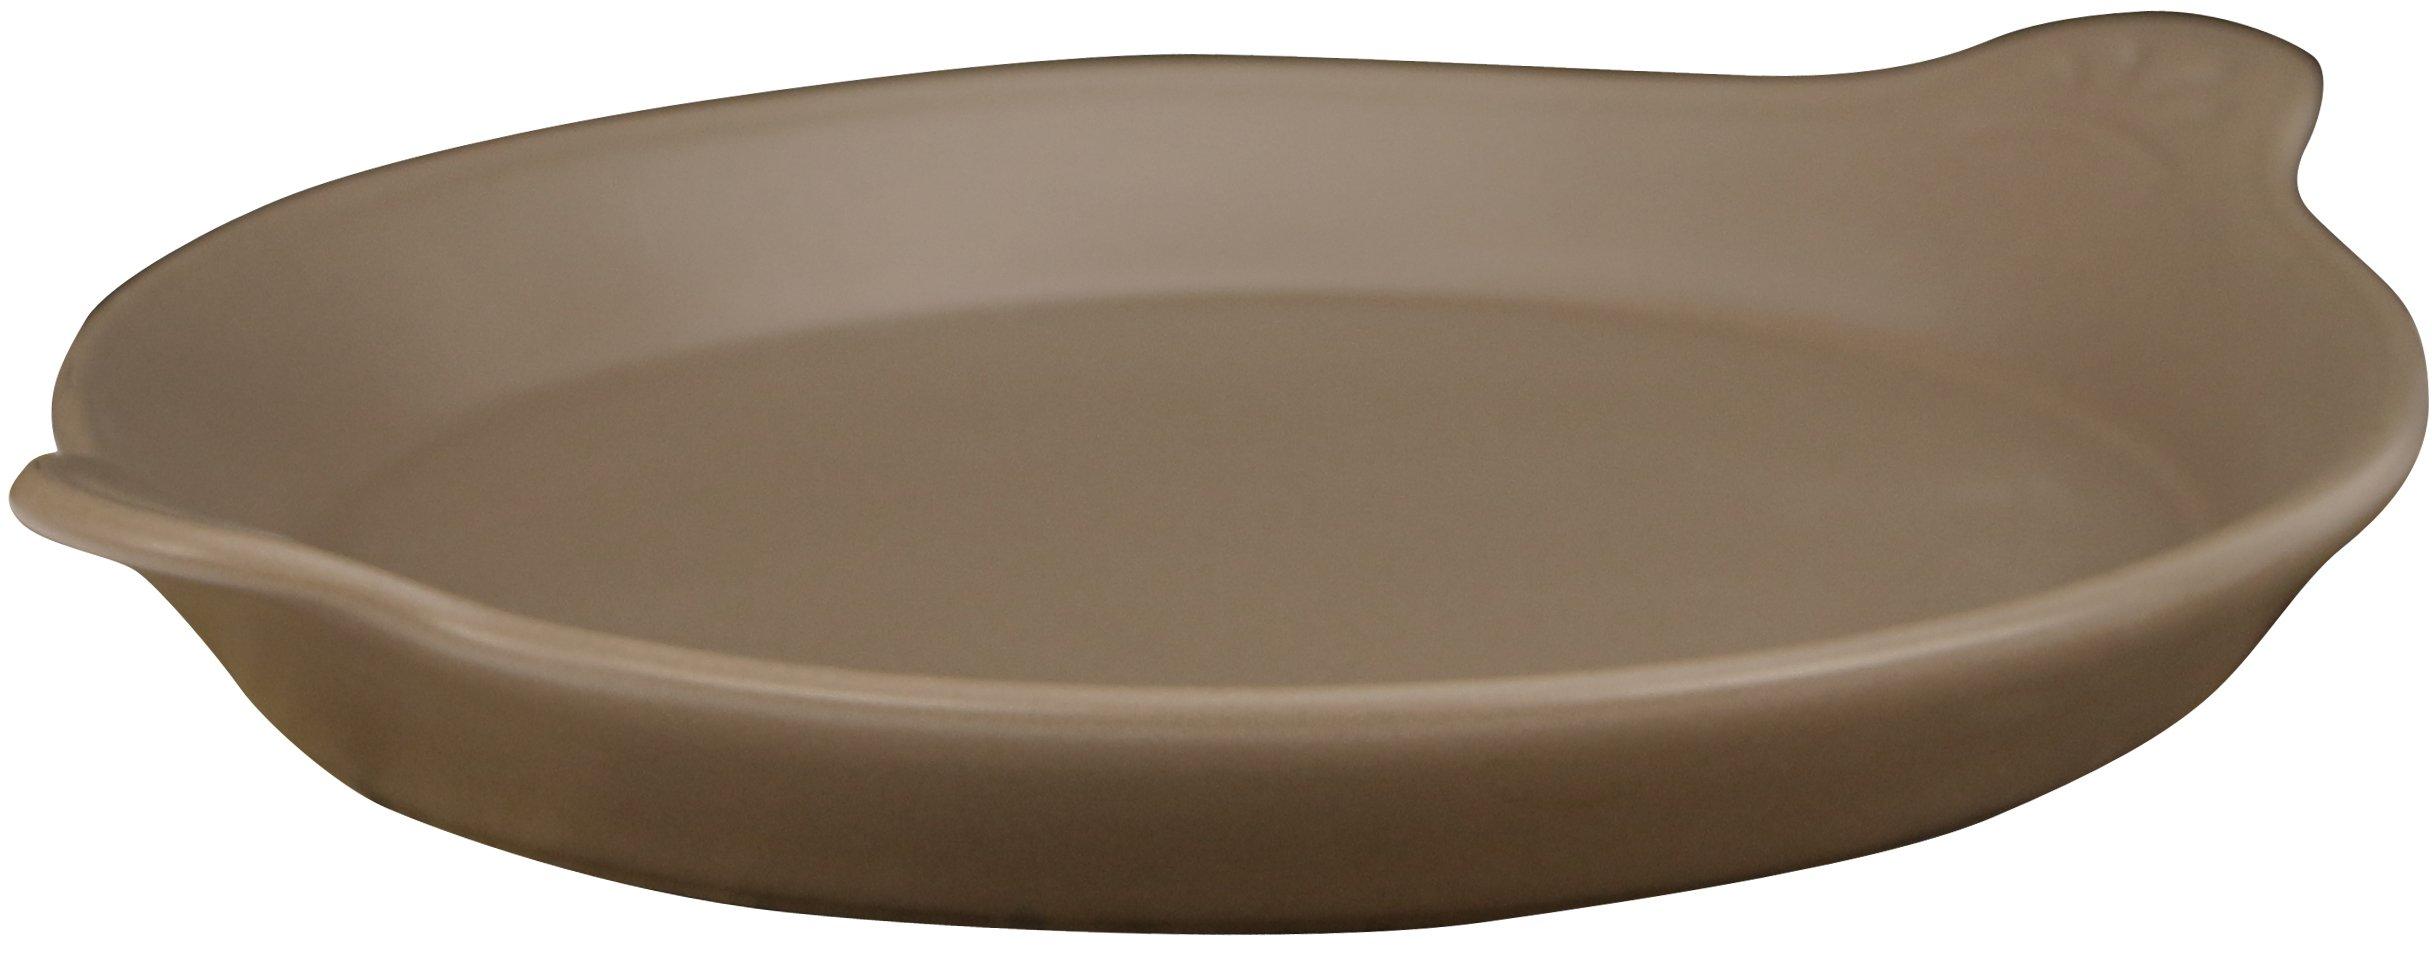 Eurita by Reston Lloyd Flame Safe Au Gratin Porcelain Pan, Small, Mocha by Reston Lloyd